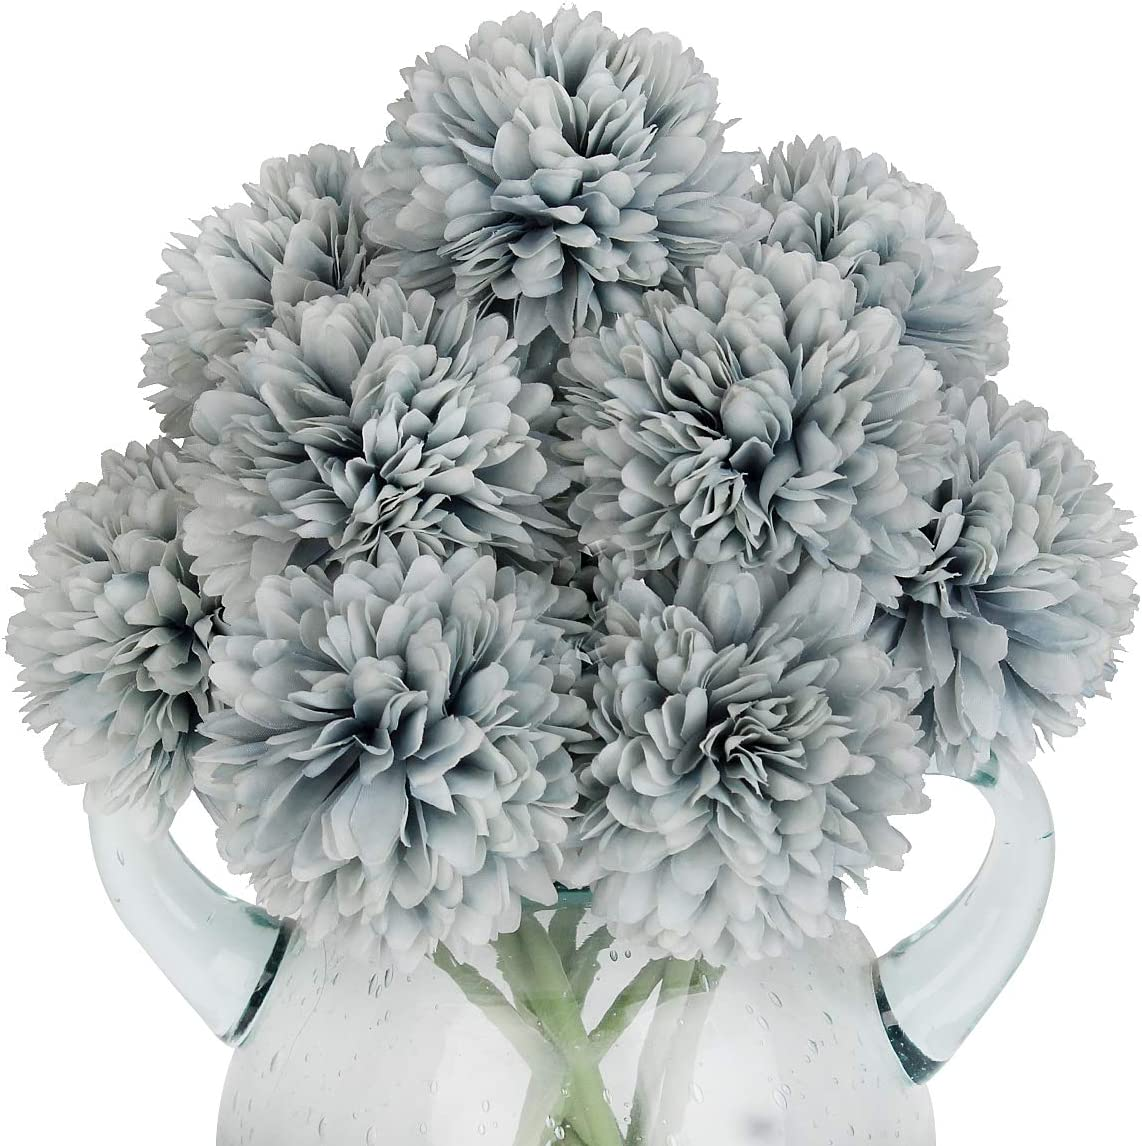 Louiesya Artificial Flowers, 10Pcs Fake Flowers Silk Artificial Chrysanthemum Ball Hydrangea Bridal Wedding Bouquet for Home Garden Party Wedding Decor (Gray Blue, 10 Pcs)